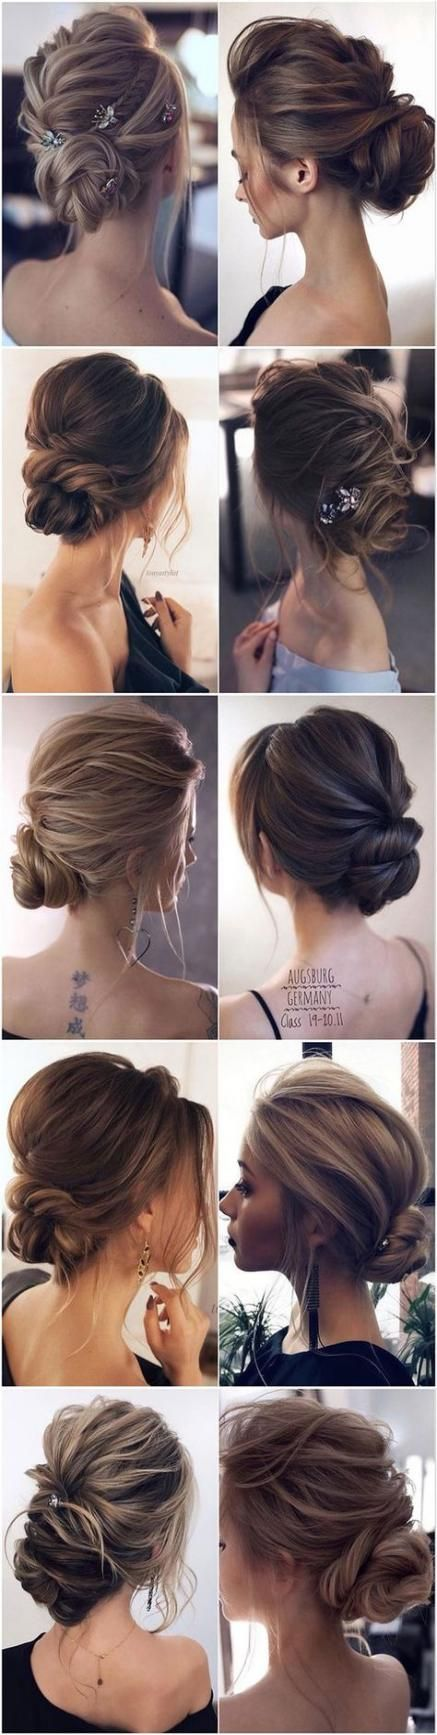 Trendy Hairstyles Updo Prom Elegant 57 Ideas